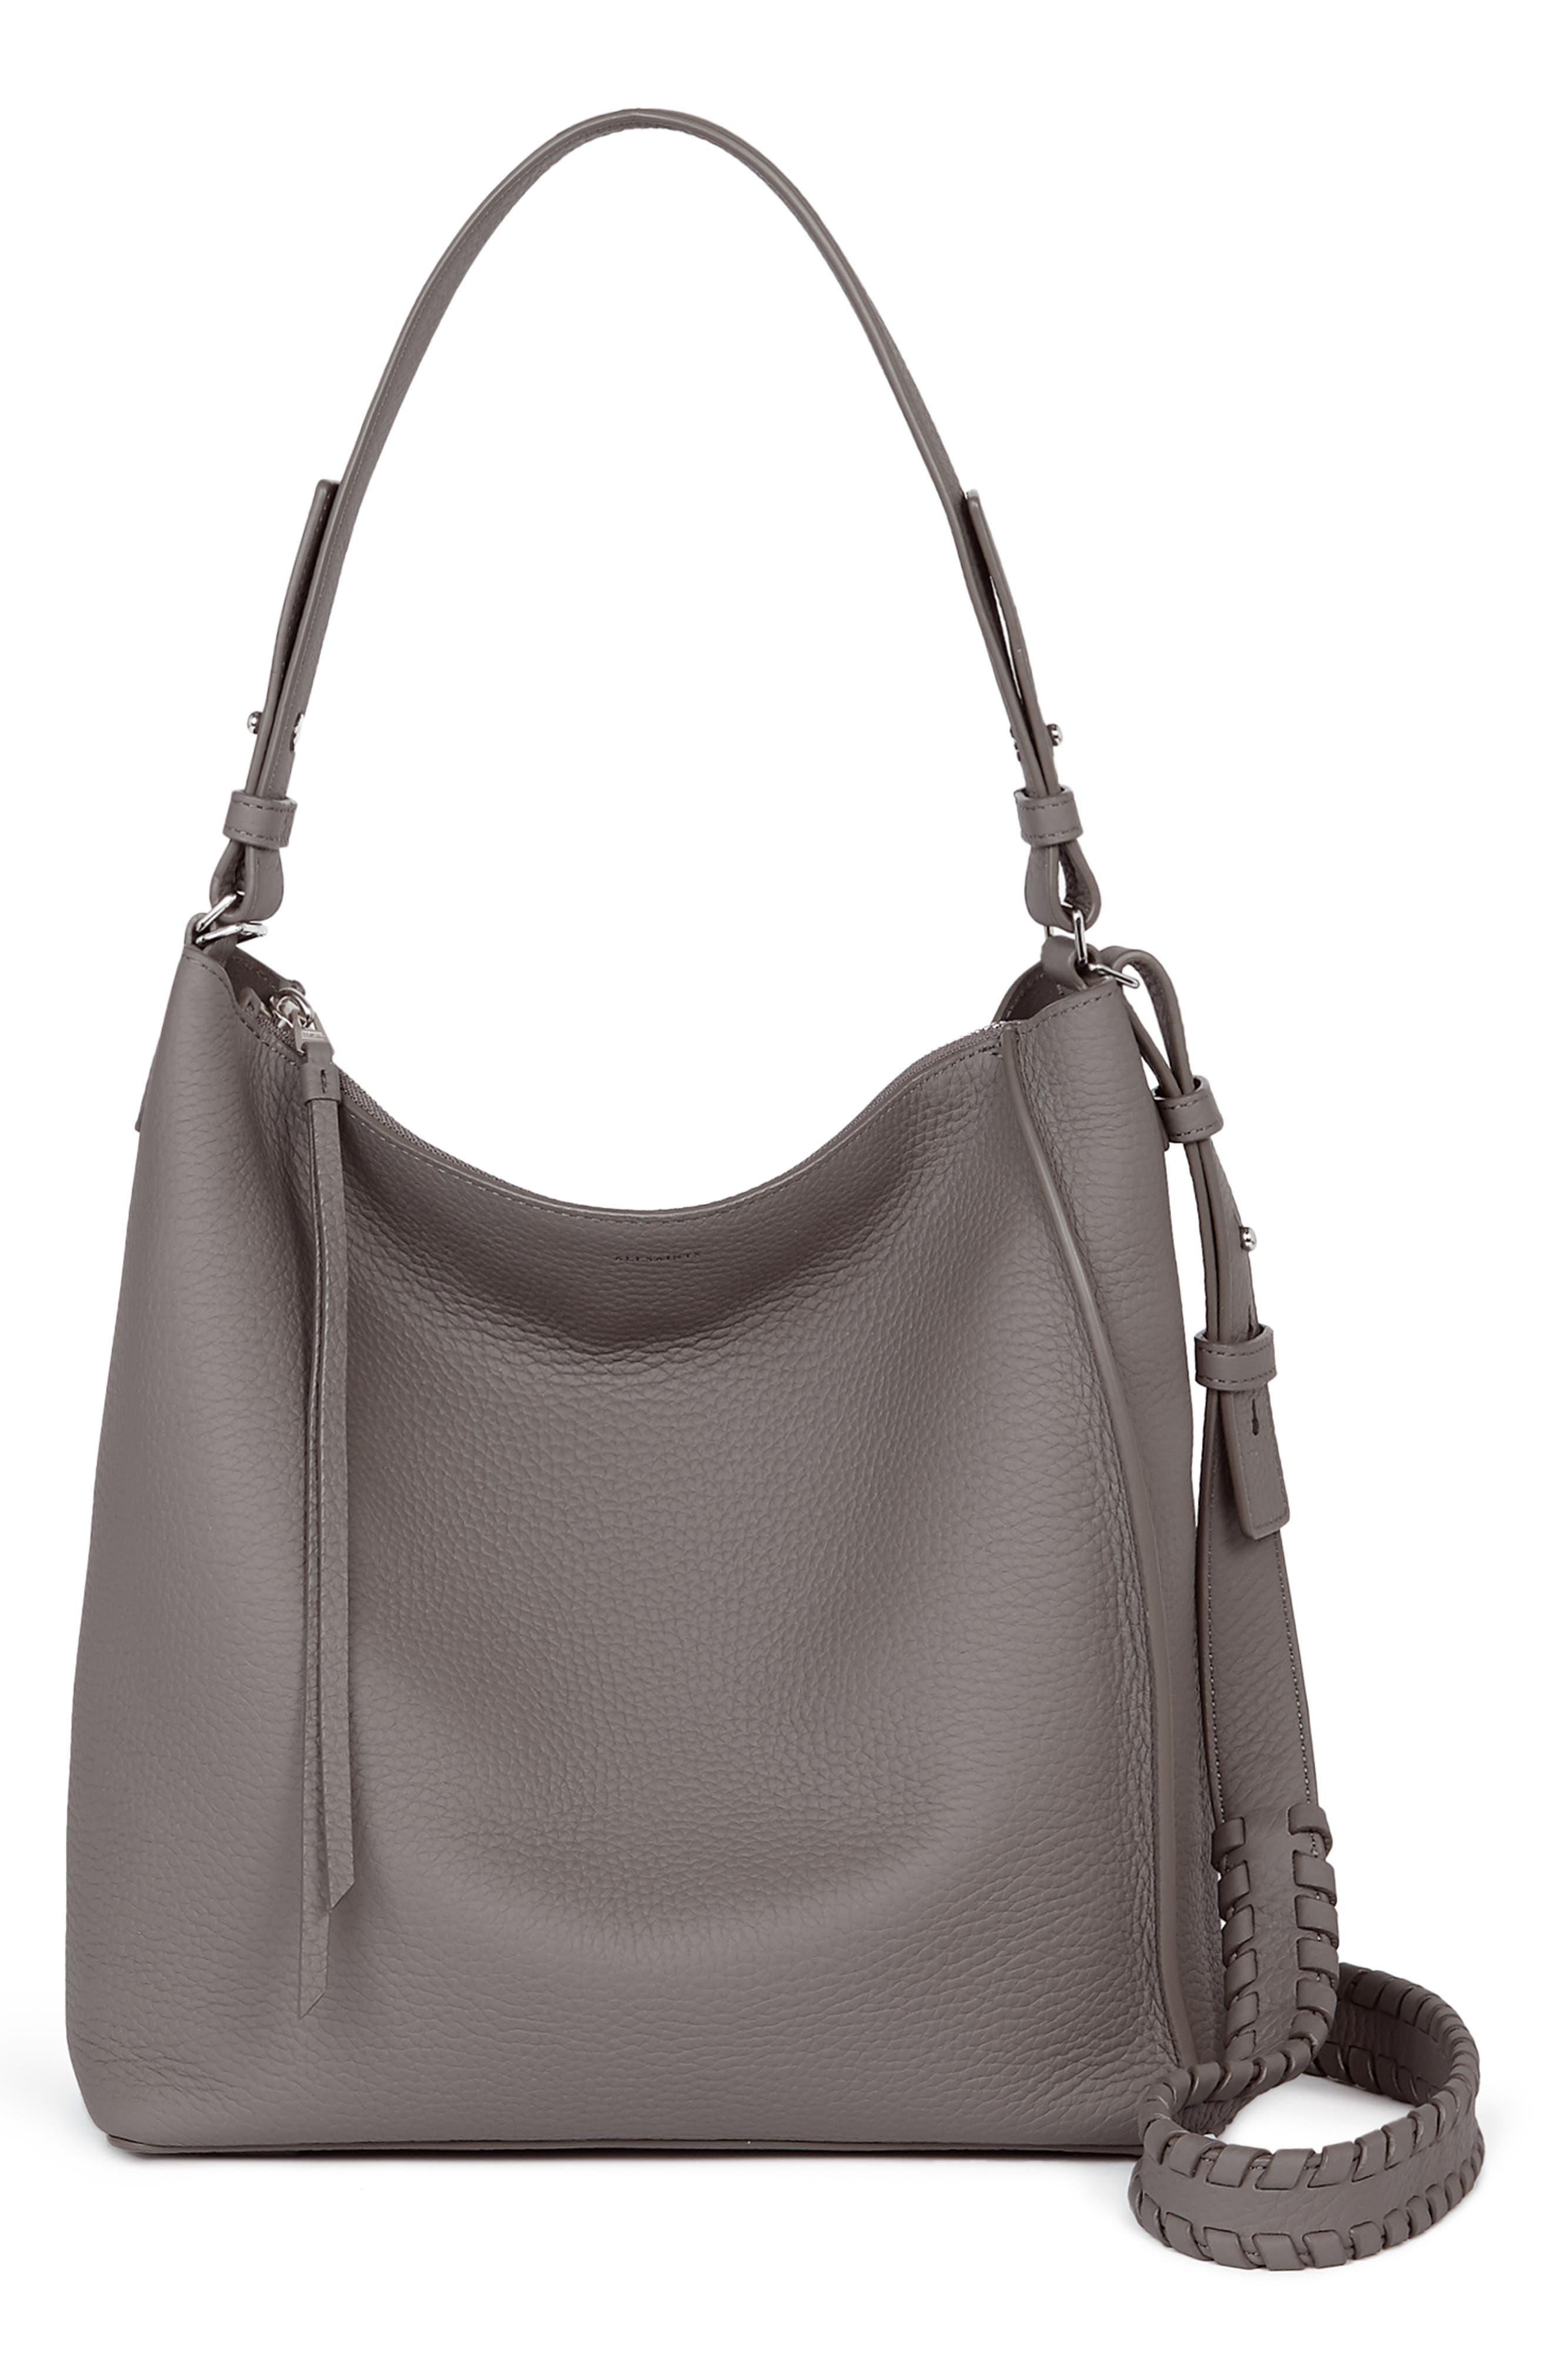 ALLSAINTS 'Kita' Leather Shoulder/Crossbody Bag, Main, color, STORM GREY